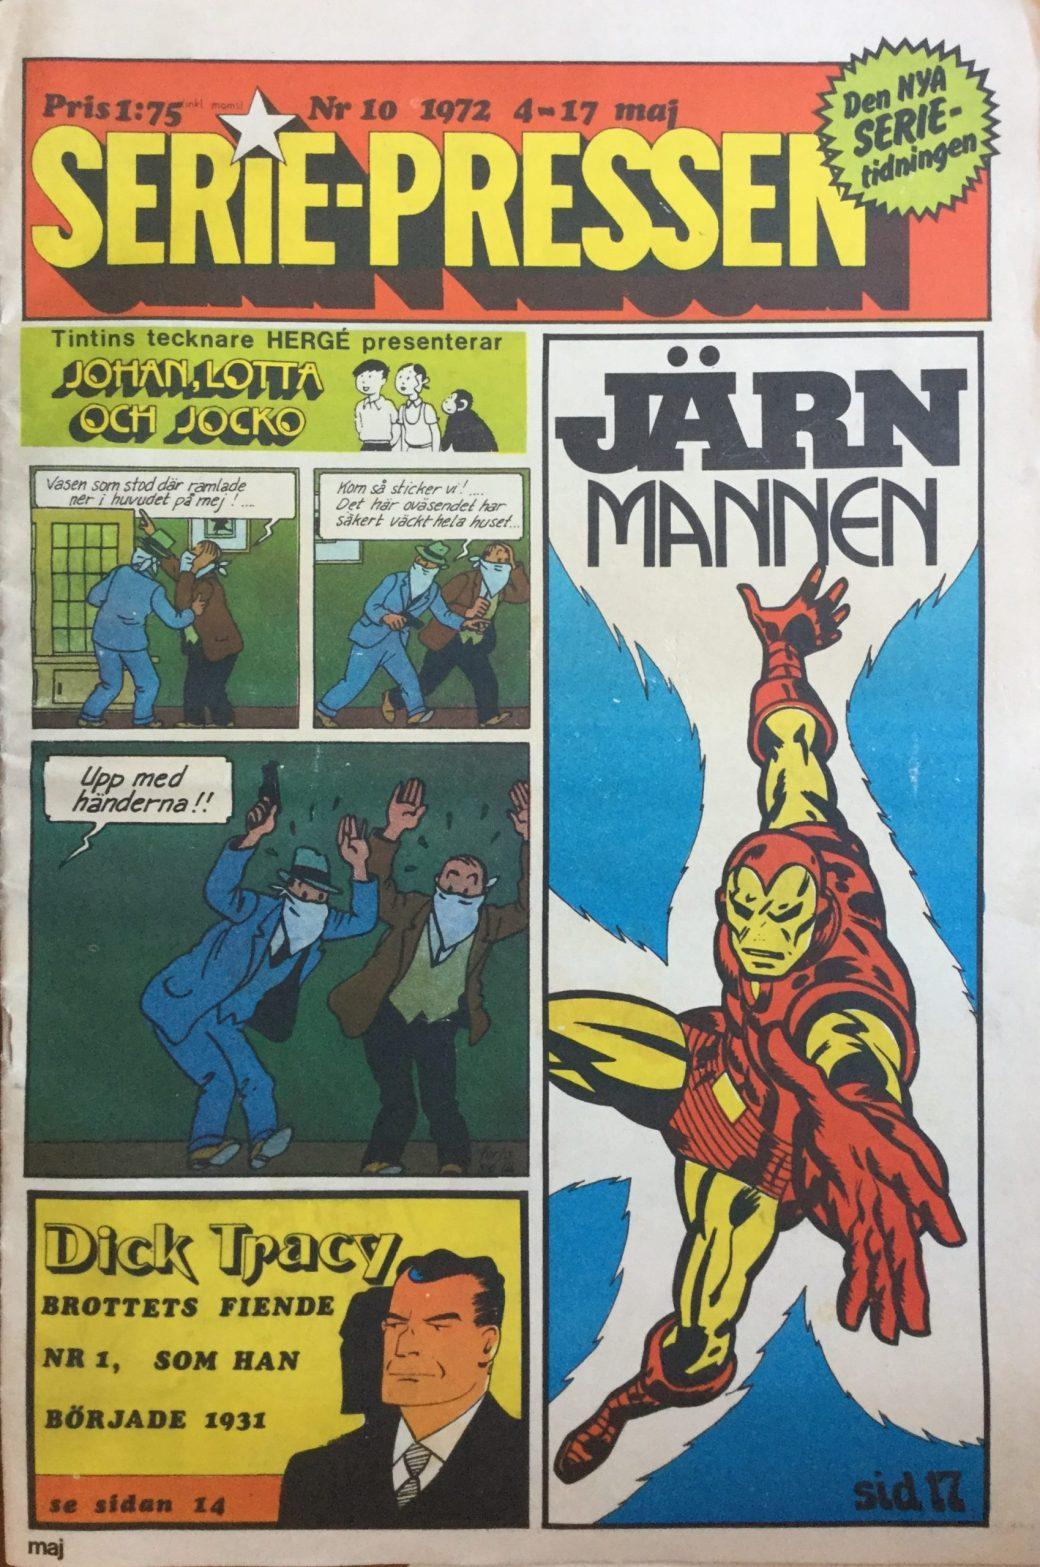 Serie-Pressen nr 10, 1972, sista numret i tabloidformat